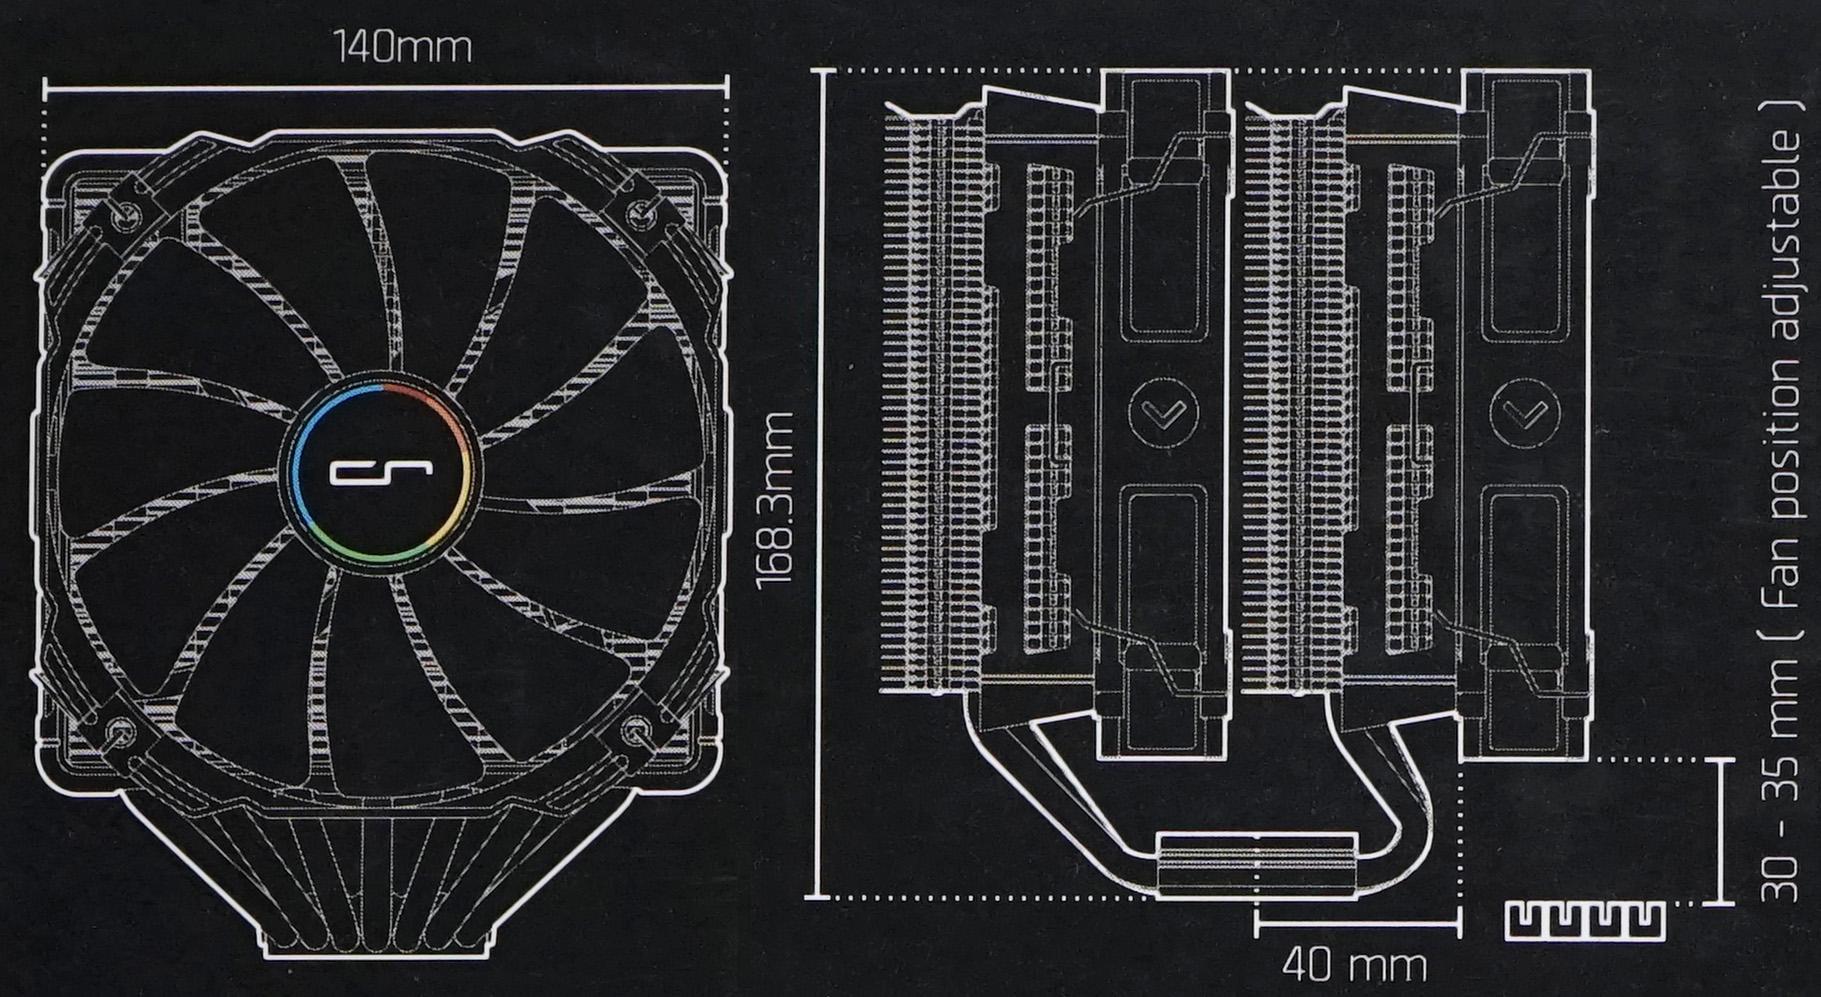 Spesifikasi Cryorig R1 c